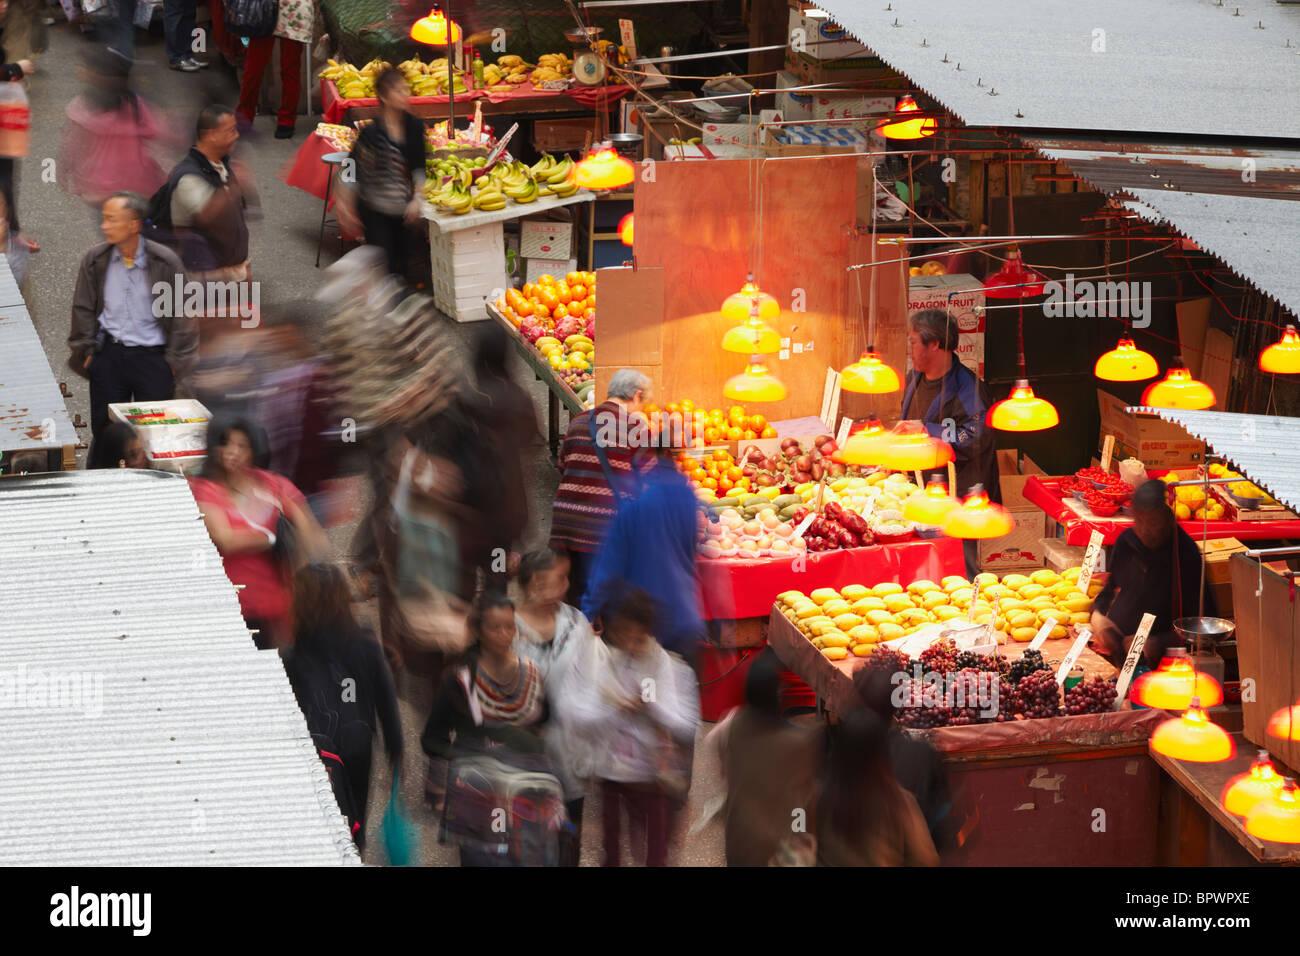 People walking along Fa Yuen Street market, Mong Kok, Kowloon, Hong Kong, China - Stock Image